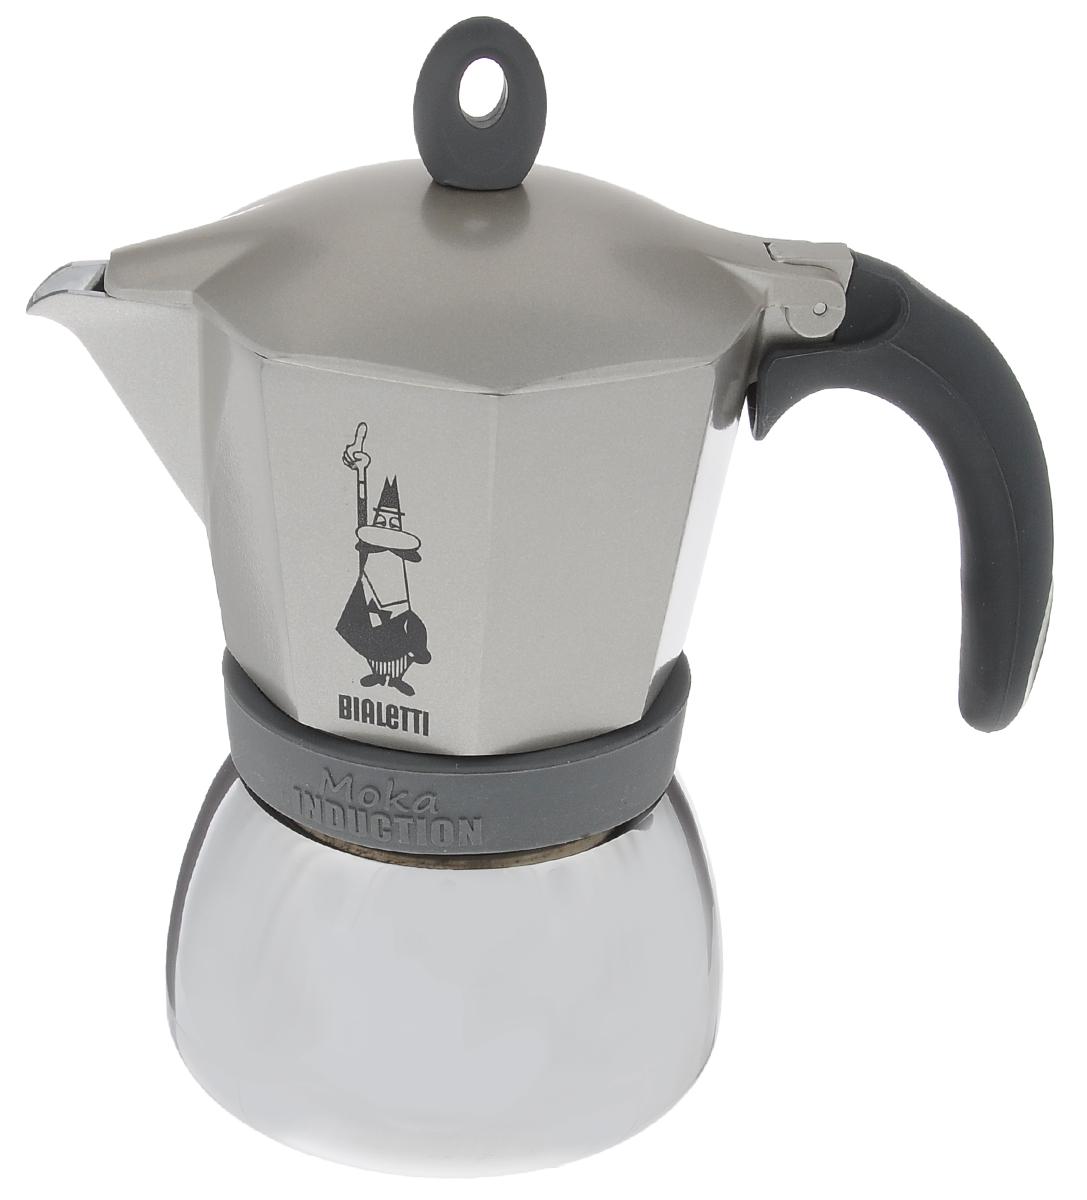 Кофеварка гейзерная Bialetti Moka Induction, цвет: серый, на 6 чашек